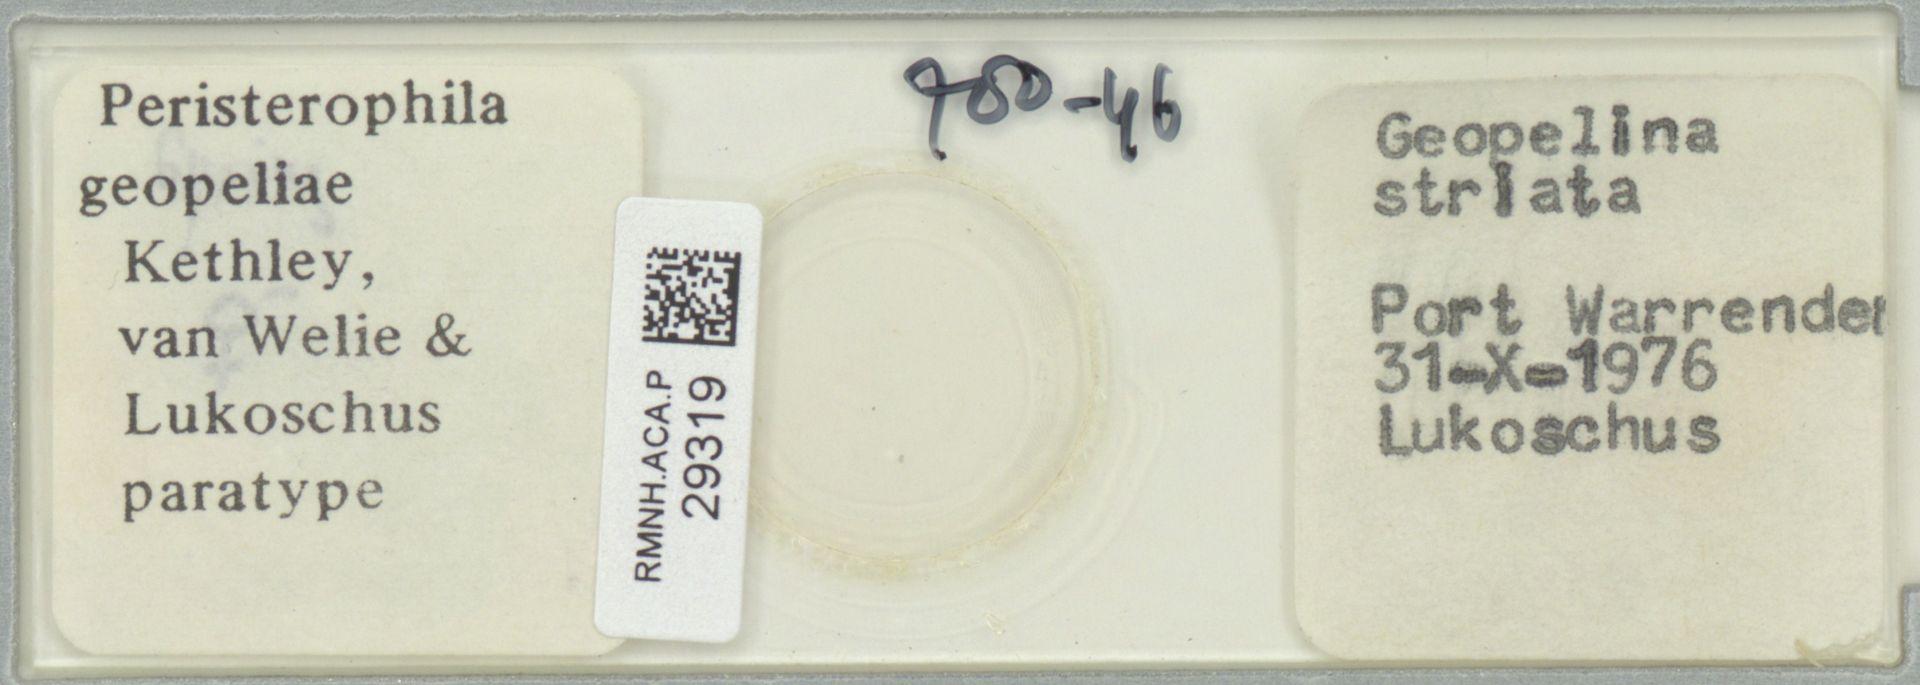 RMNH.ACA.P.29319 | Peristerophila geopeliae Kethley, van Welie & Lukoschus